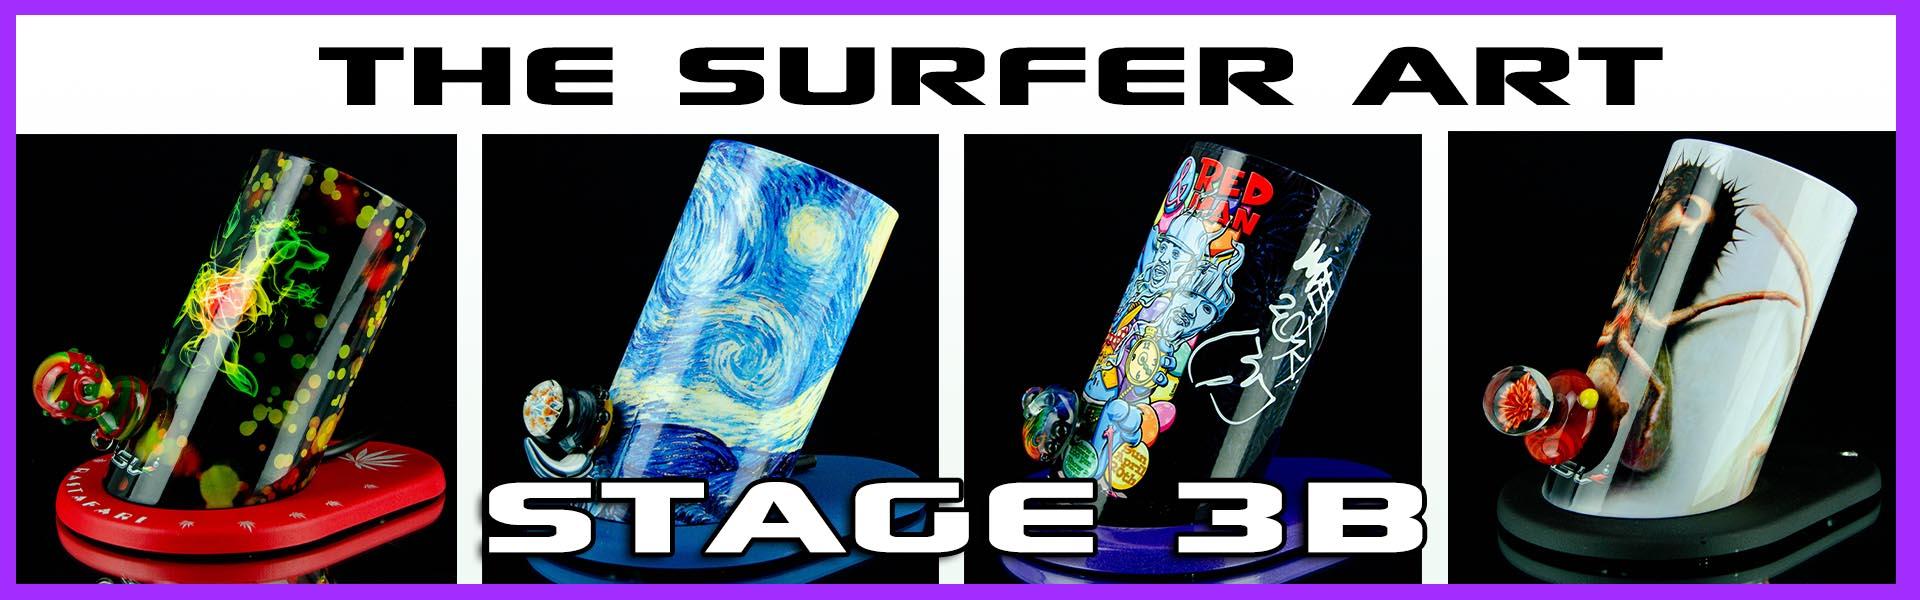 stage-3-surfer-art2.jpg